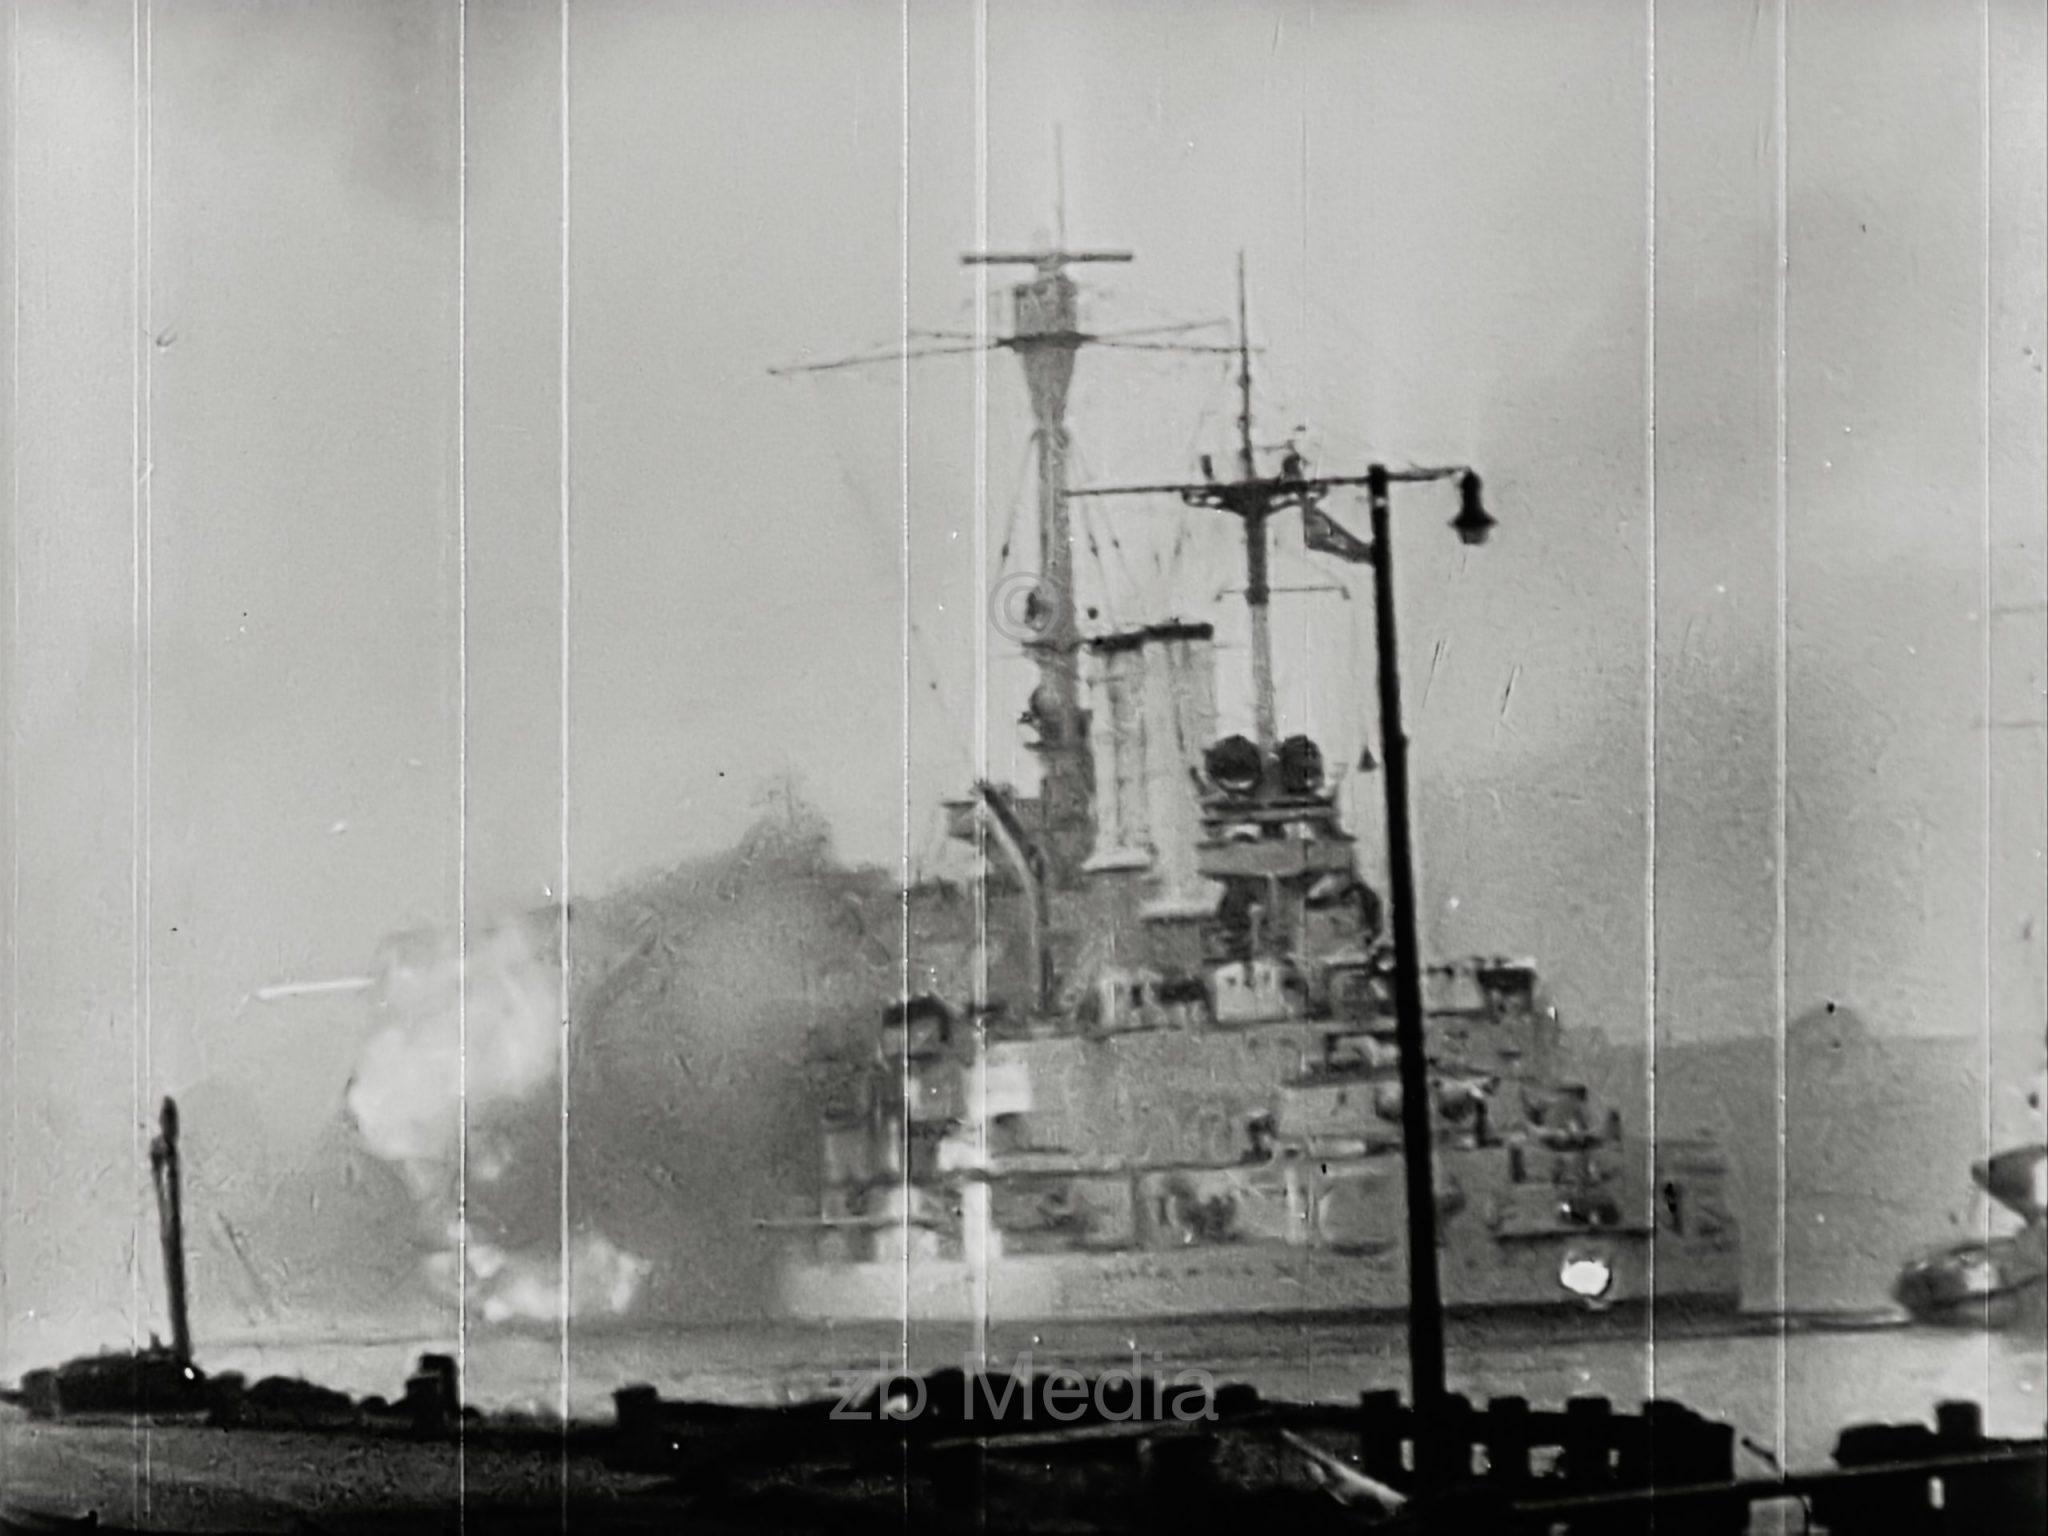 Start of the war 1939 - bombardment of Westerplatte